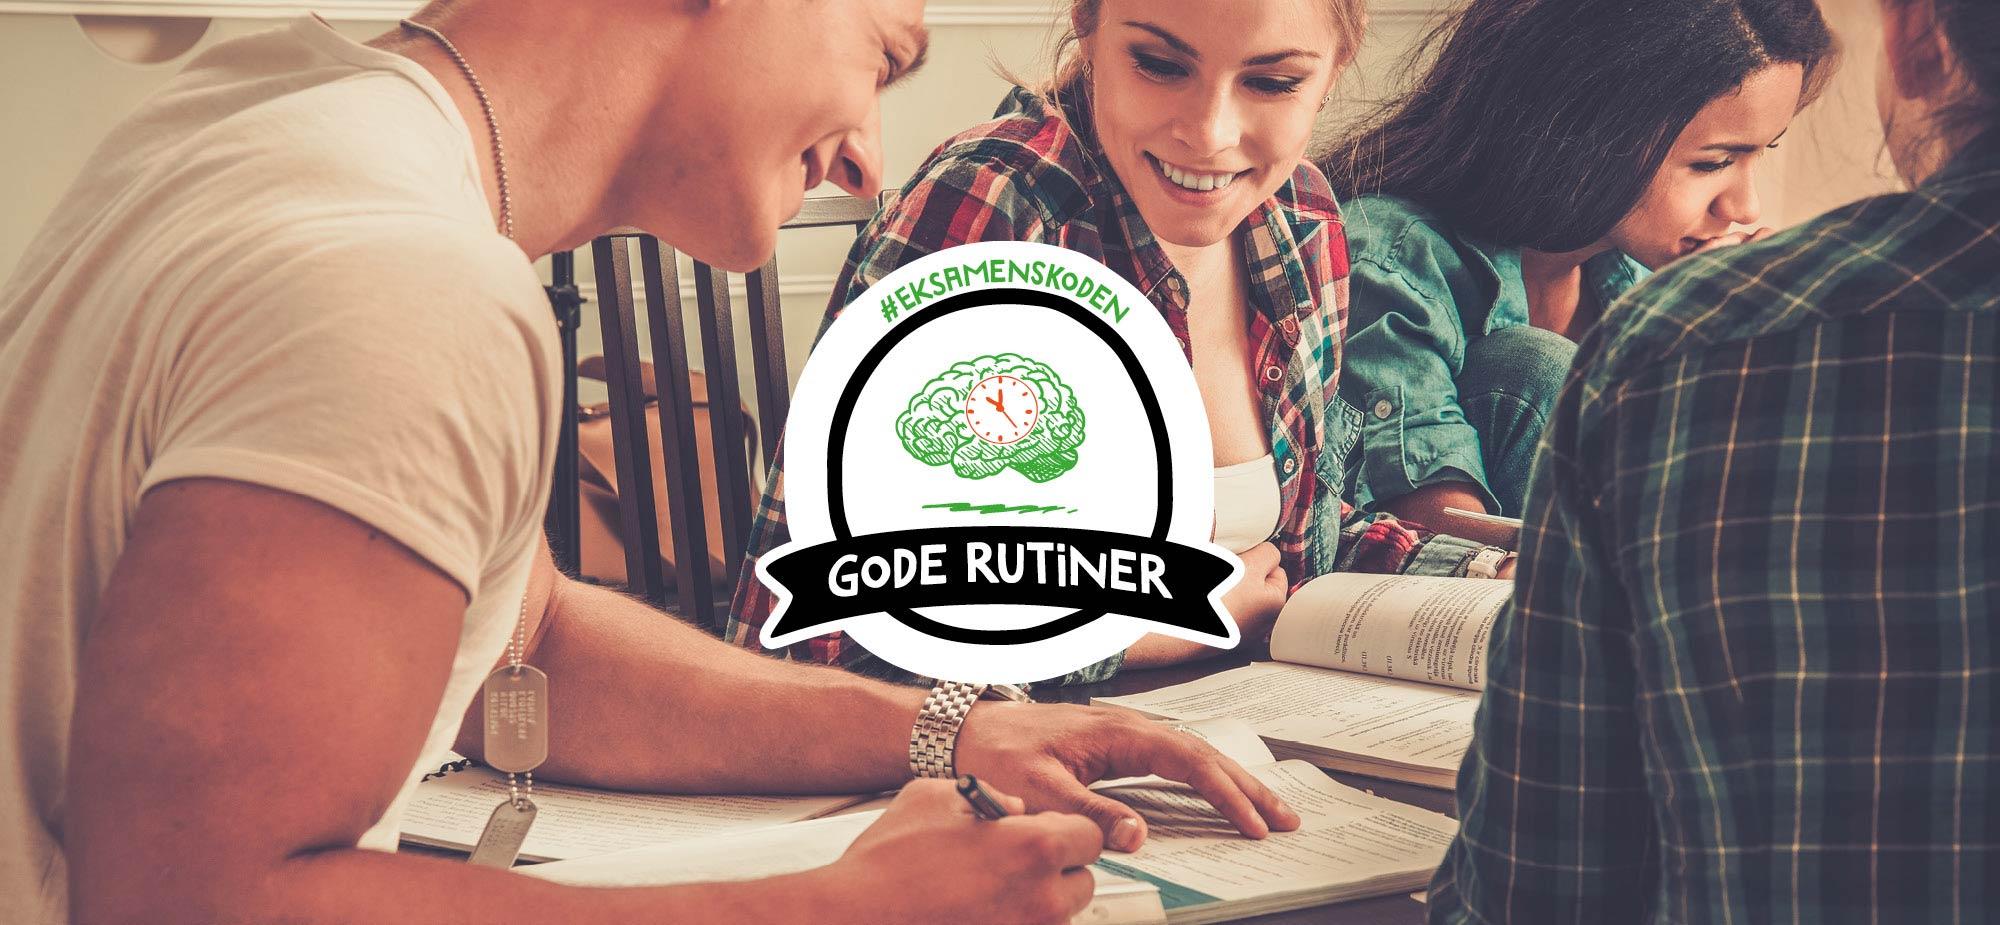 Eksamenskoden fokusområdet Gode rutiner